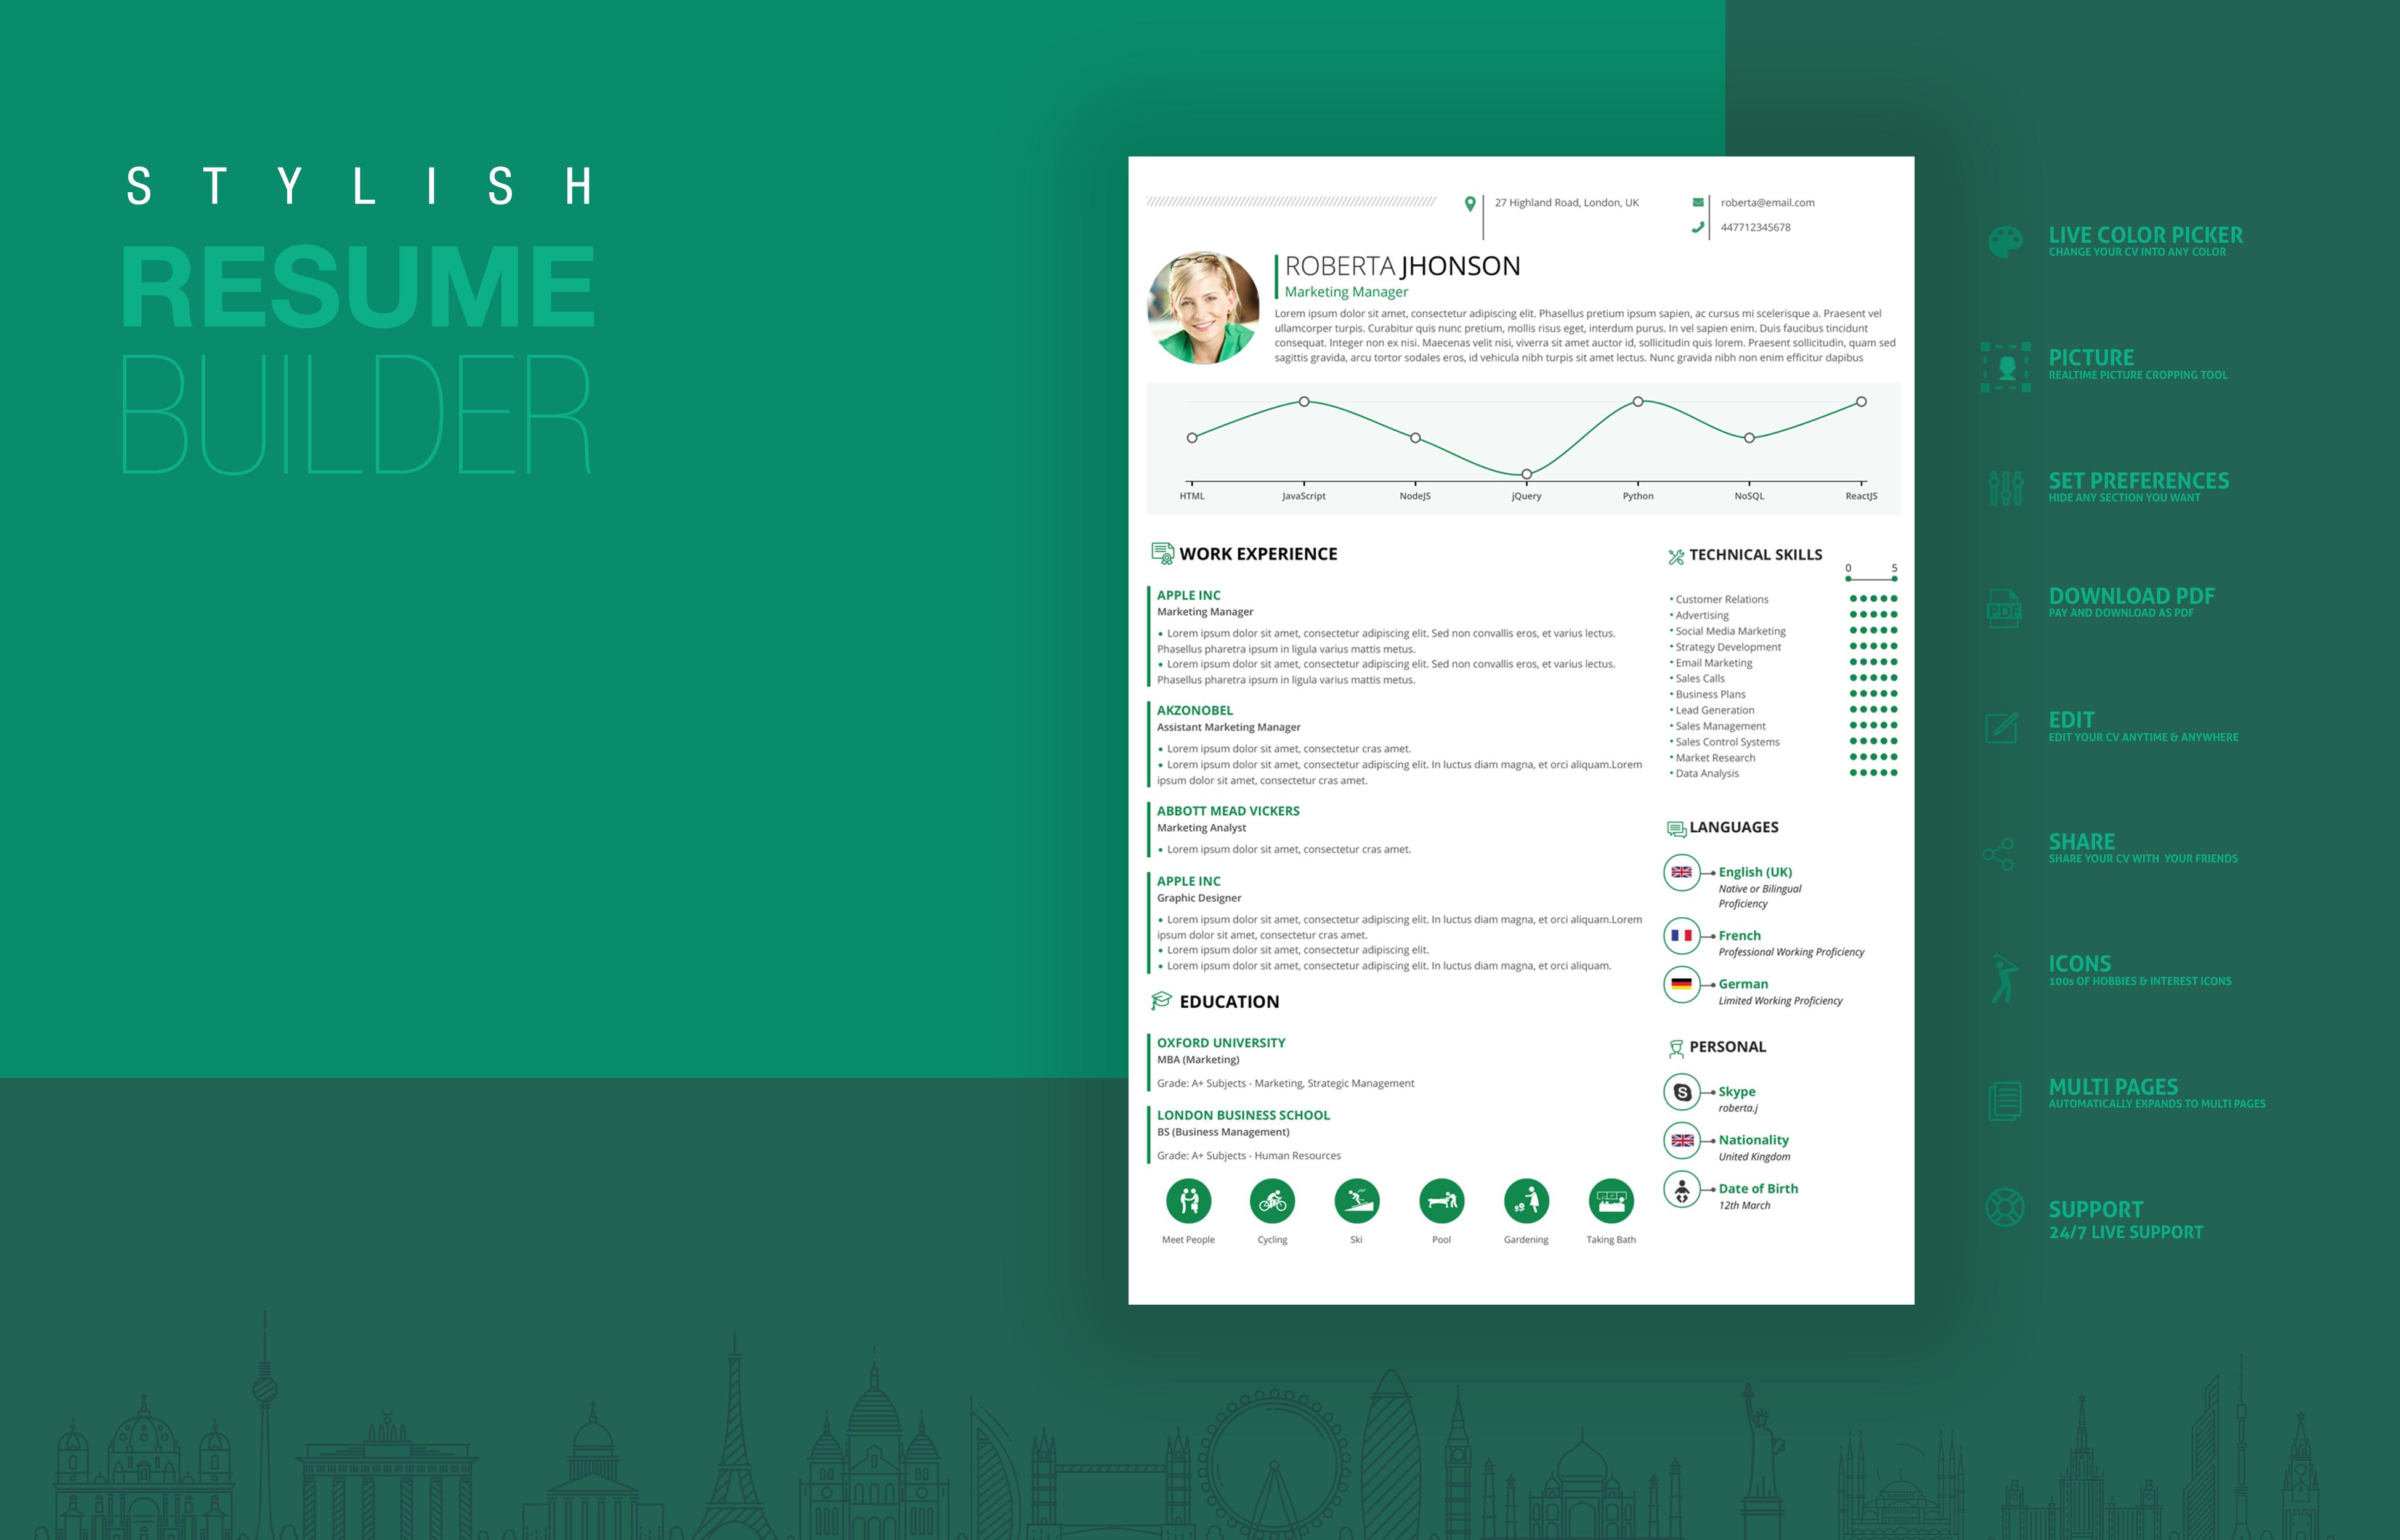 stylish resume resume builder cv cv builder cv template cv